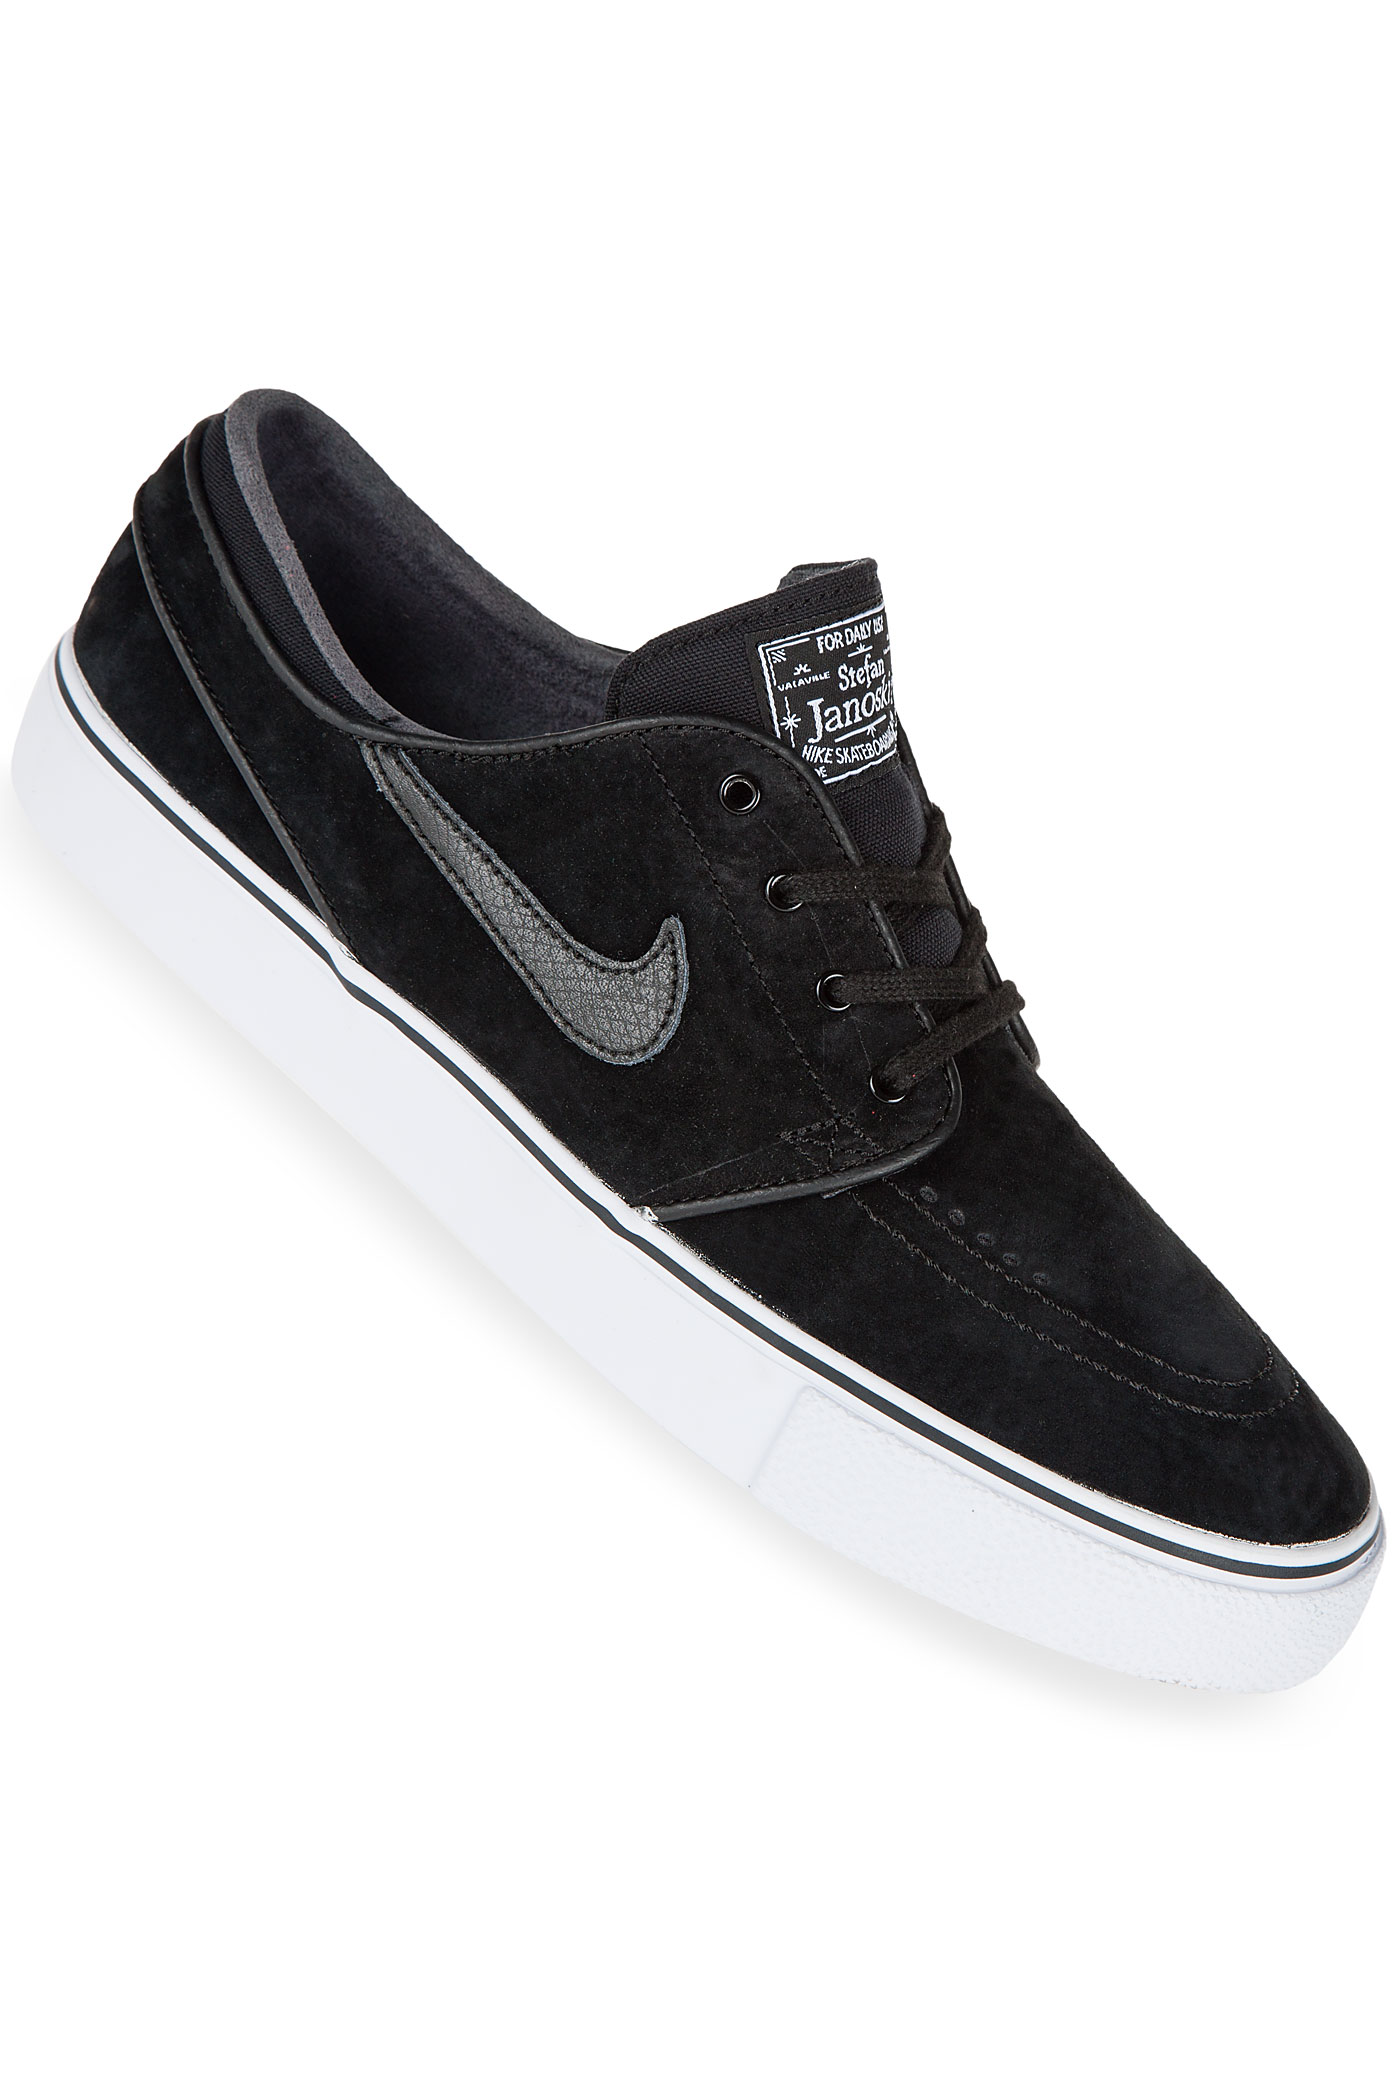 Nike Sb Shoes Wiki